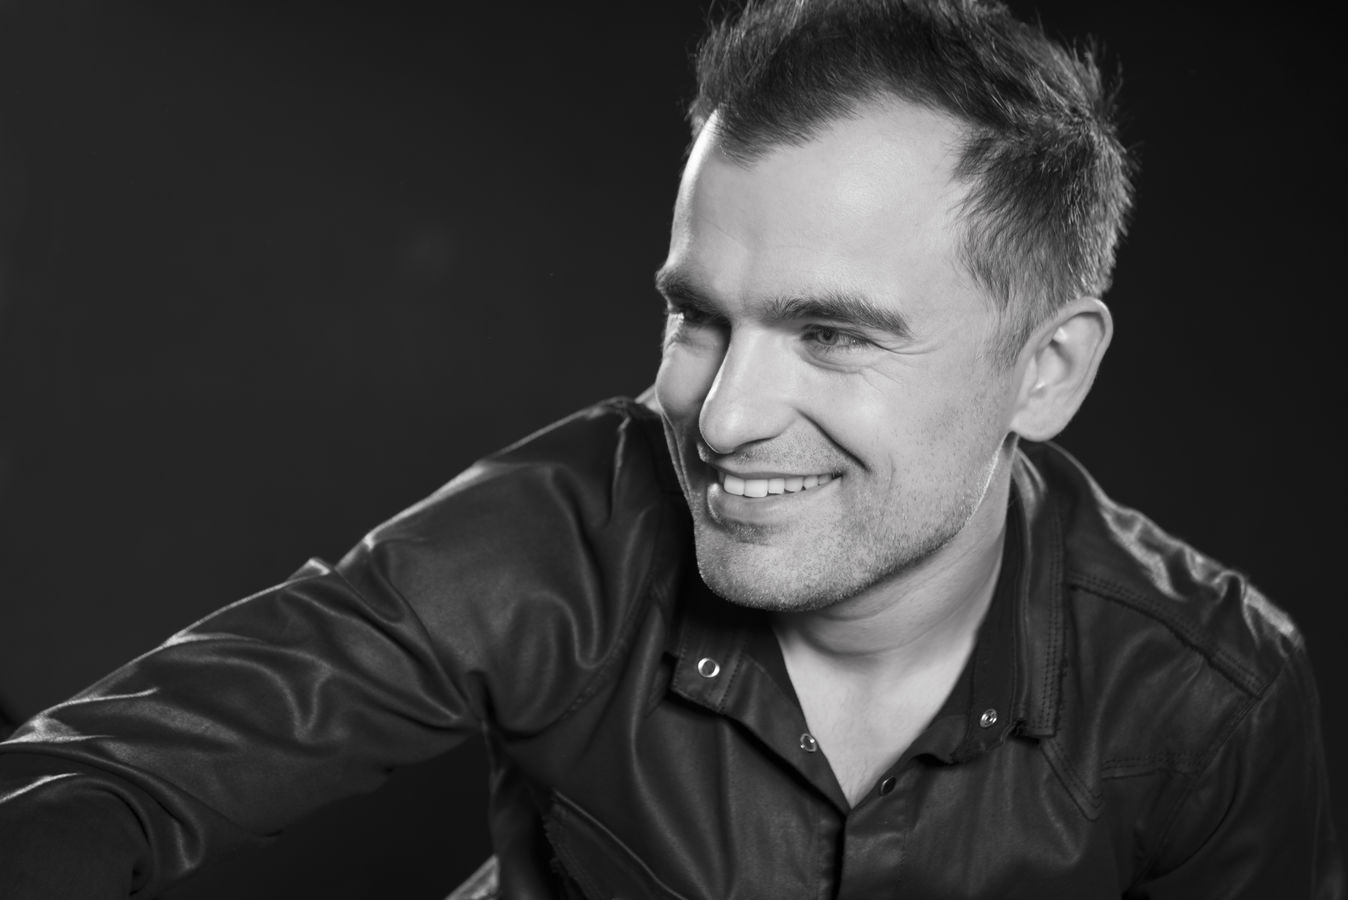 Michał Rudaś